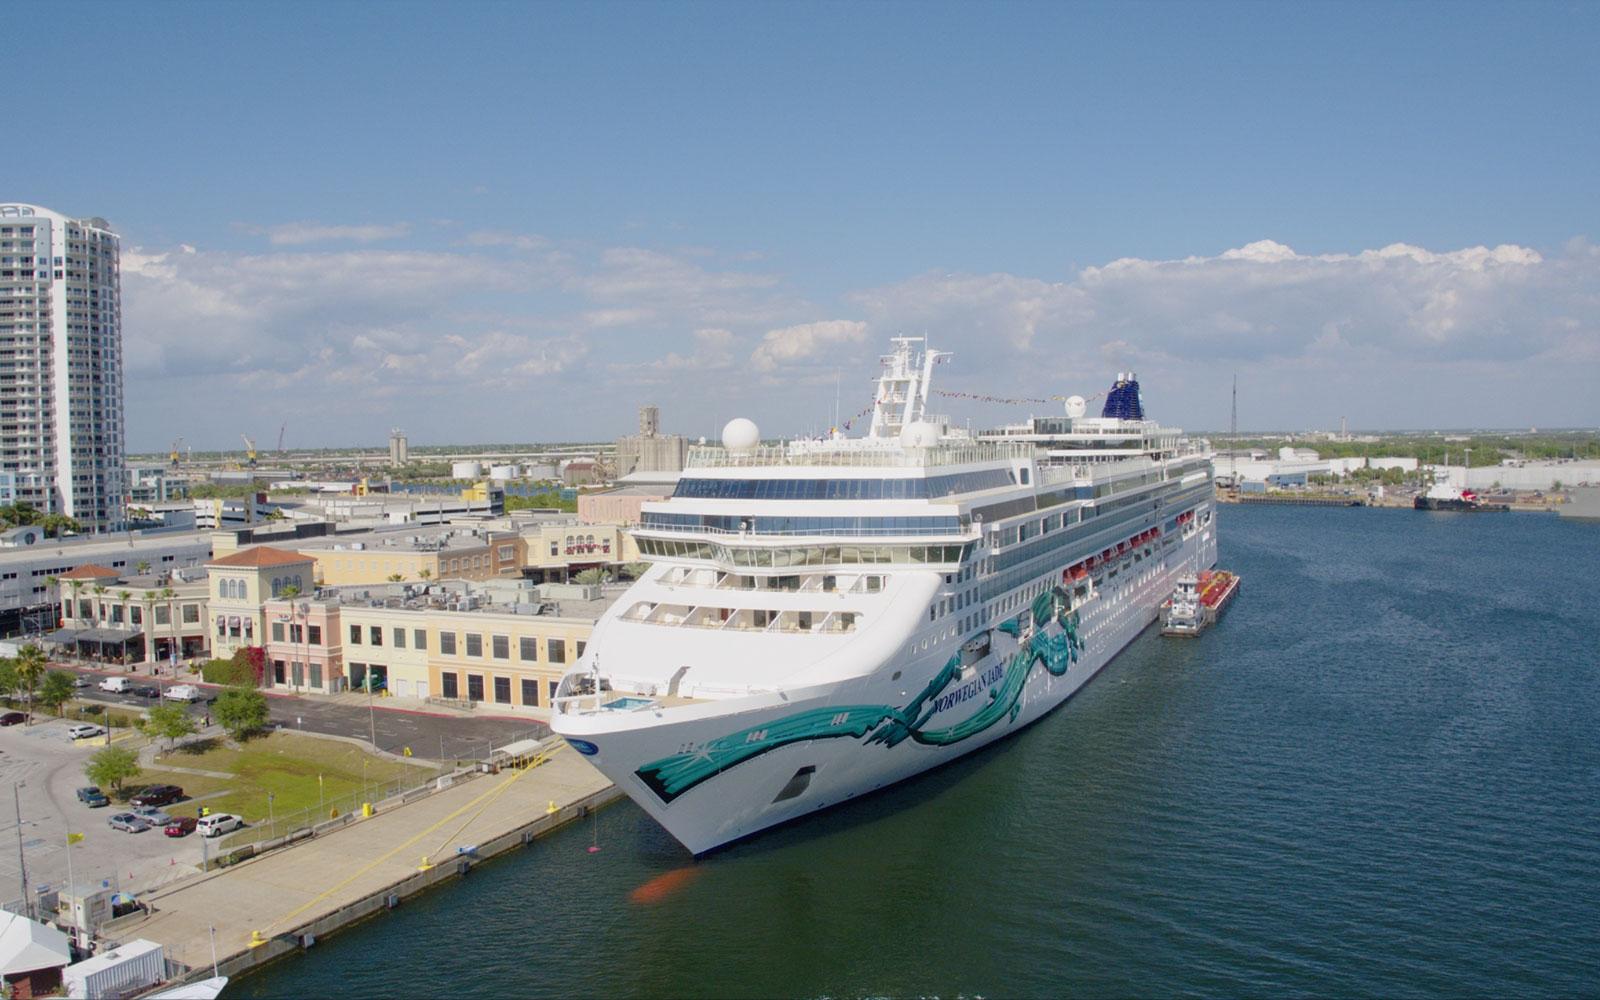 Port Of Tampa Bay Official Information - Cruise Terminal Tampa Florida Map